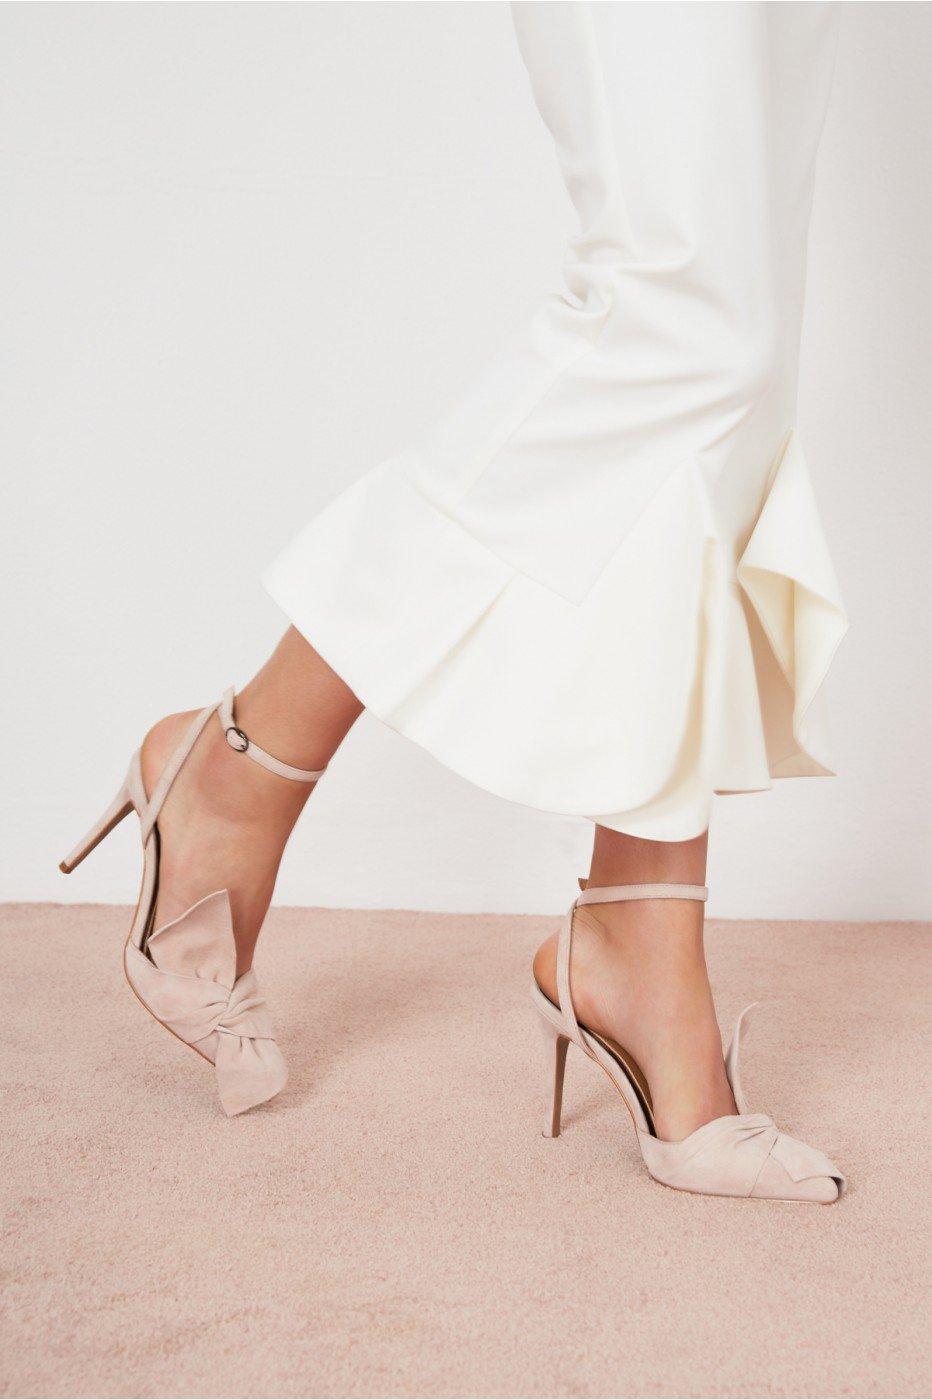 Jaggar Union Heel In Pale Pink